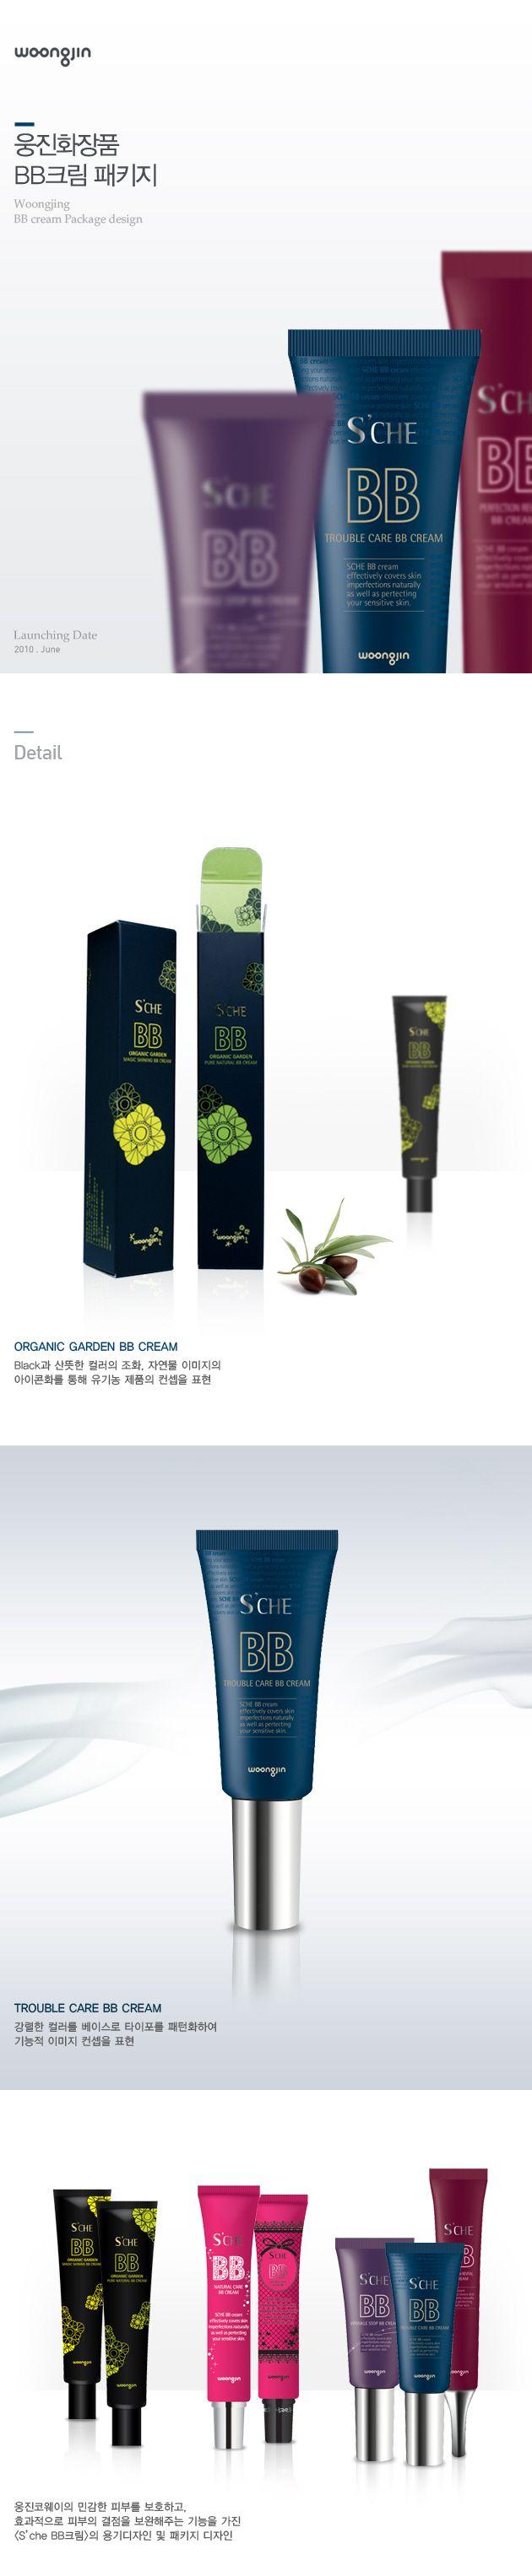 Woongjin BB cream Package design #edacom